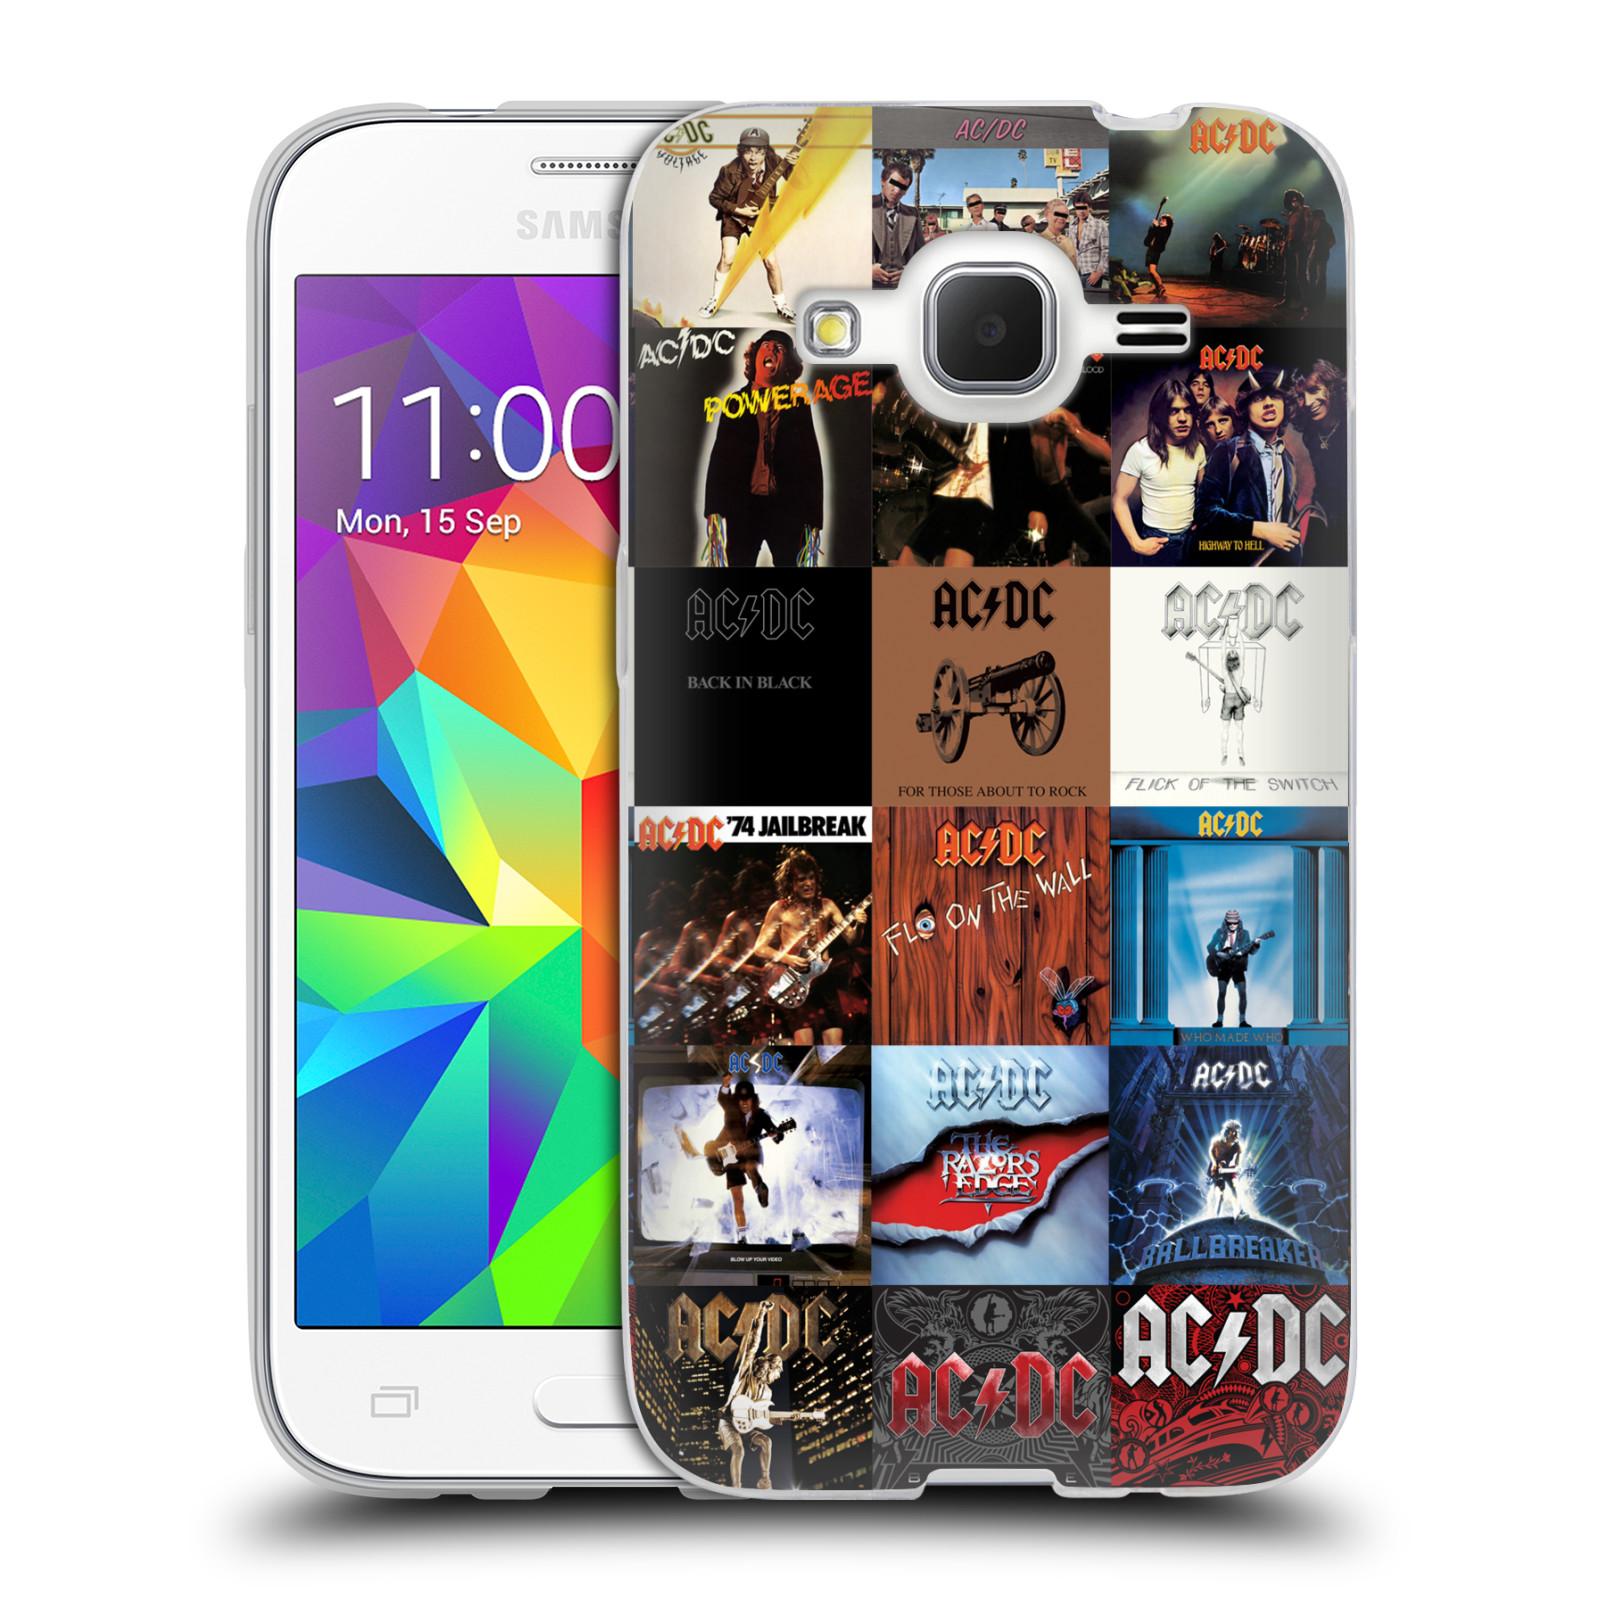 HEAD CASE silikonový obal na mobil Samsung Galaxy Core Prime (G360) rocková skupina ACDC seznam alba